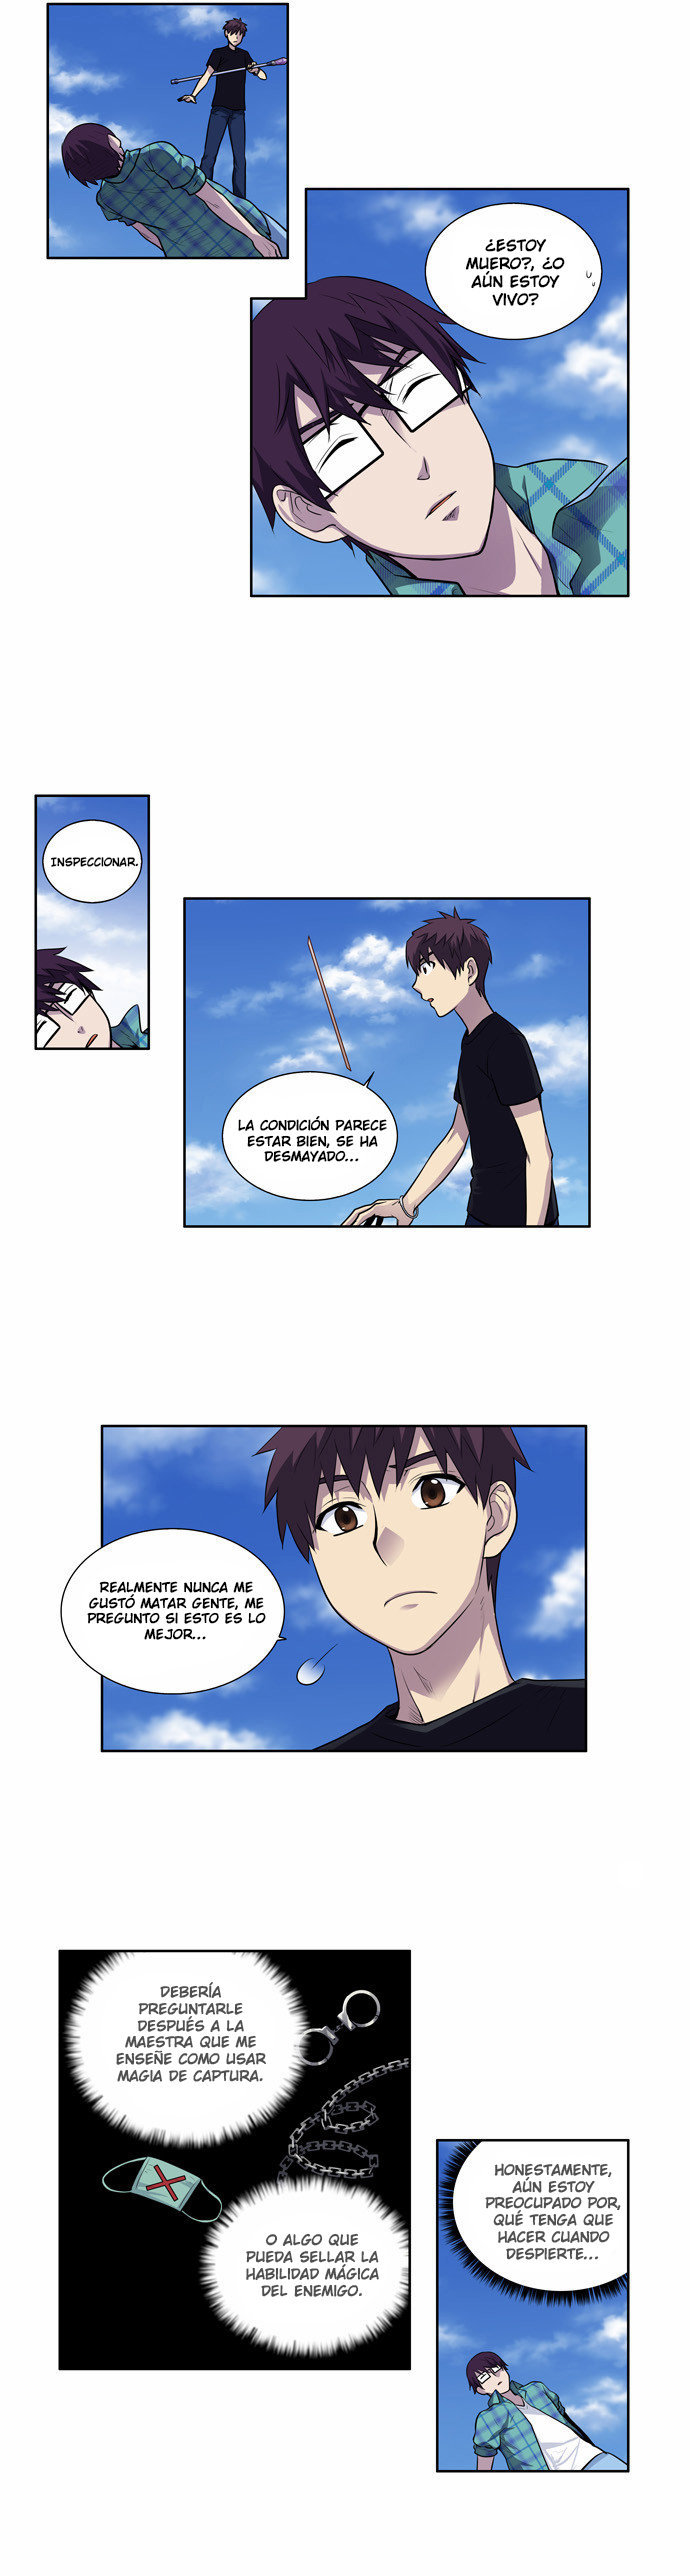 https://c5.ninemanga.com/es_manga/61/1725/442818/d2781a317ba36080eb9fbda2345946ac.jpg Page 9